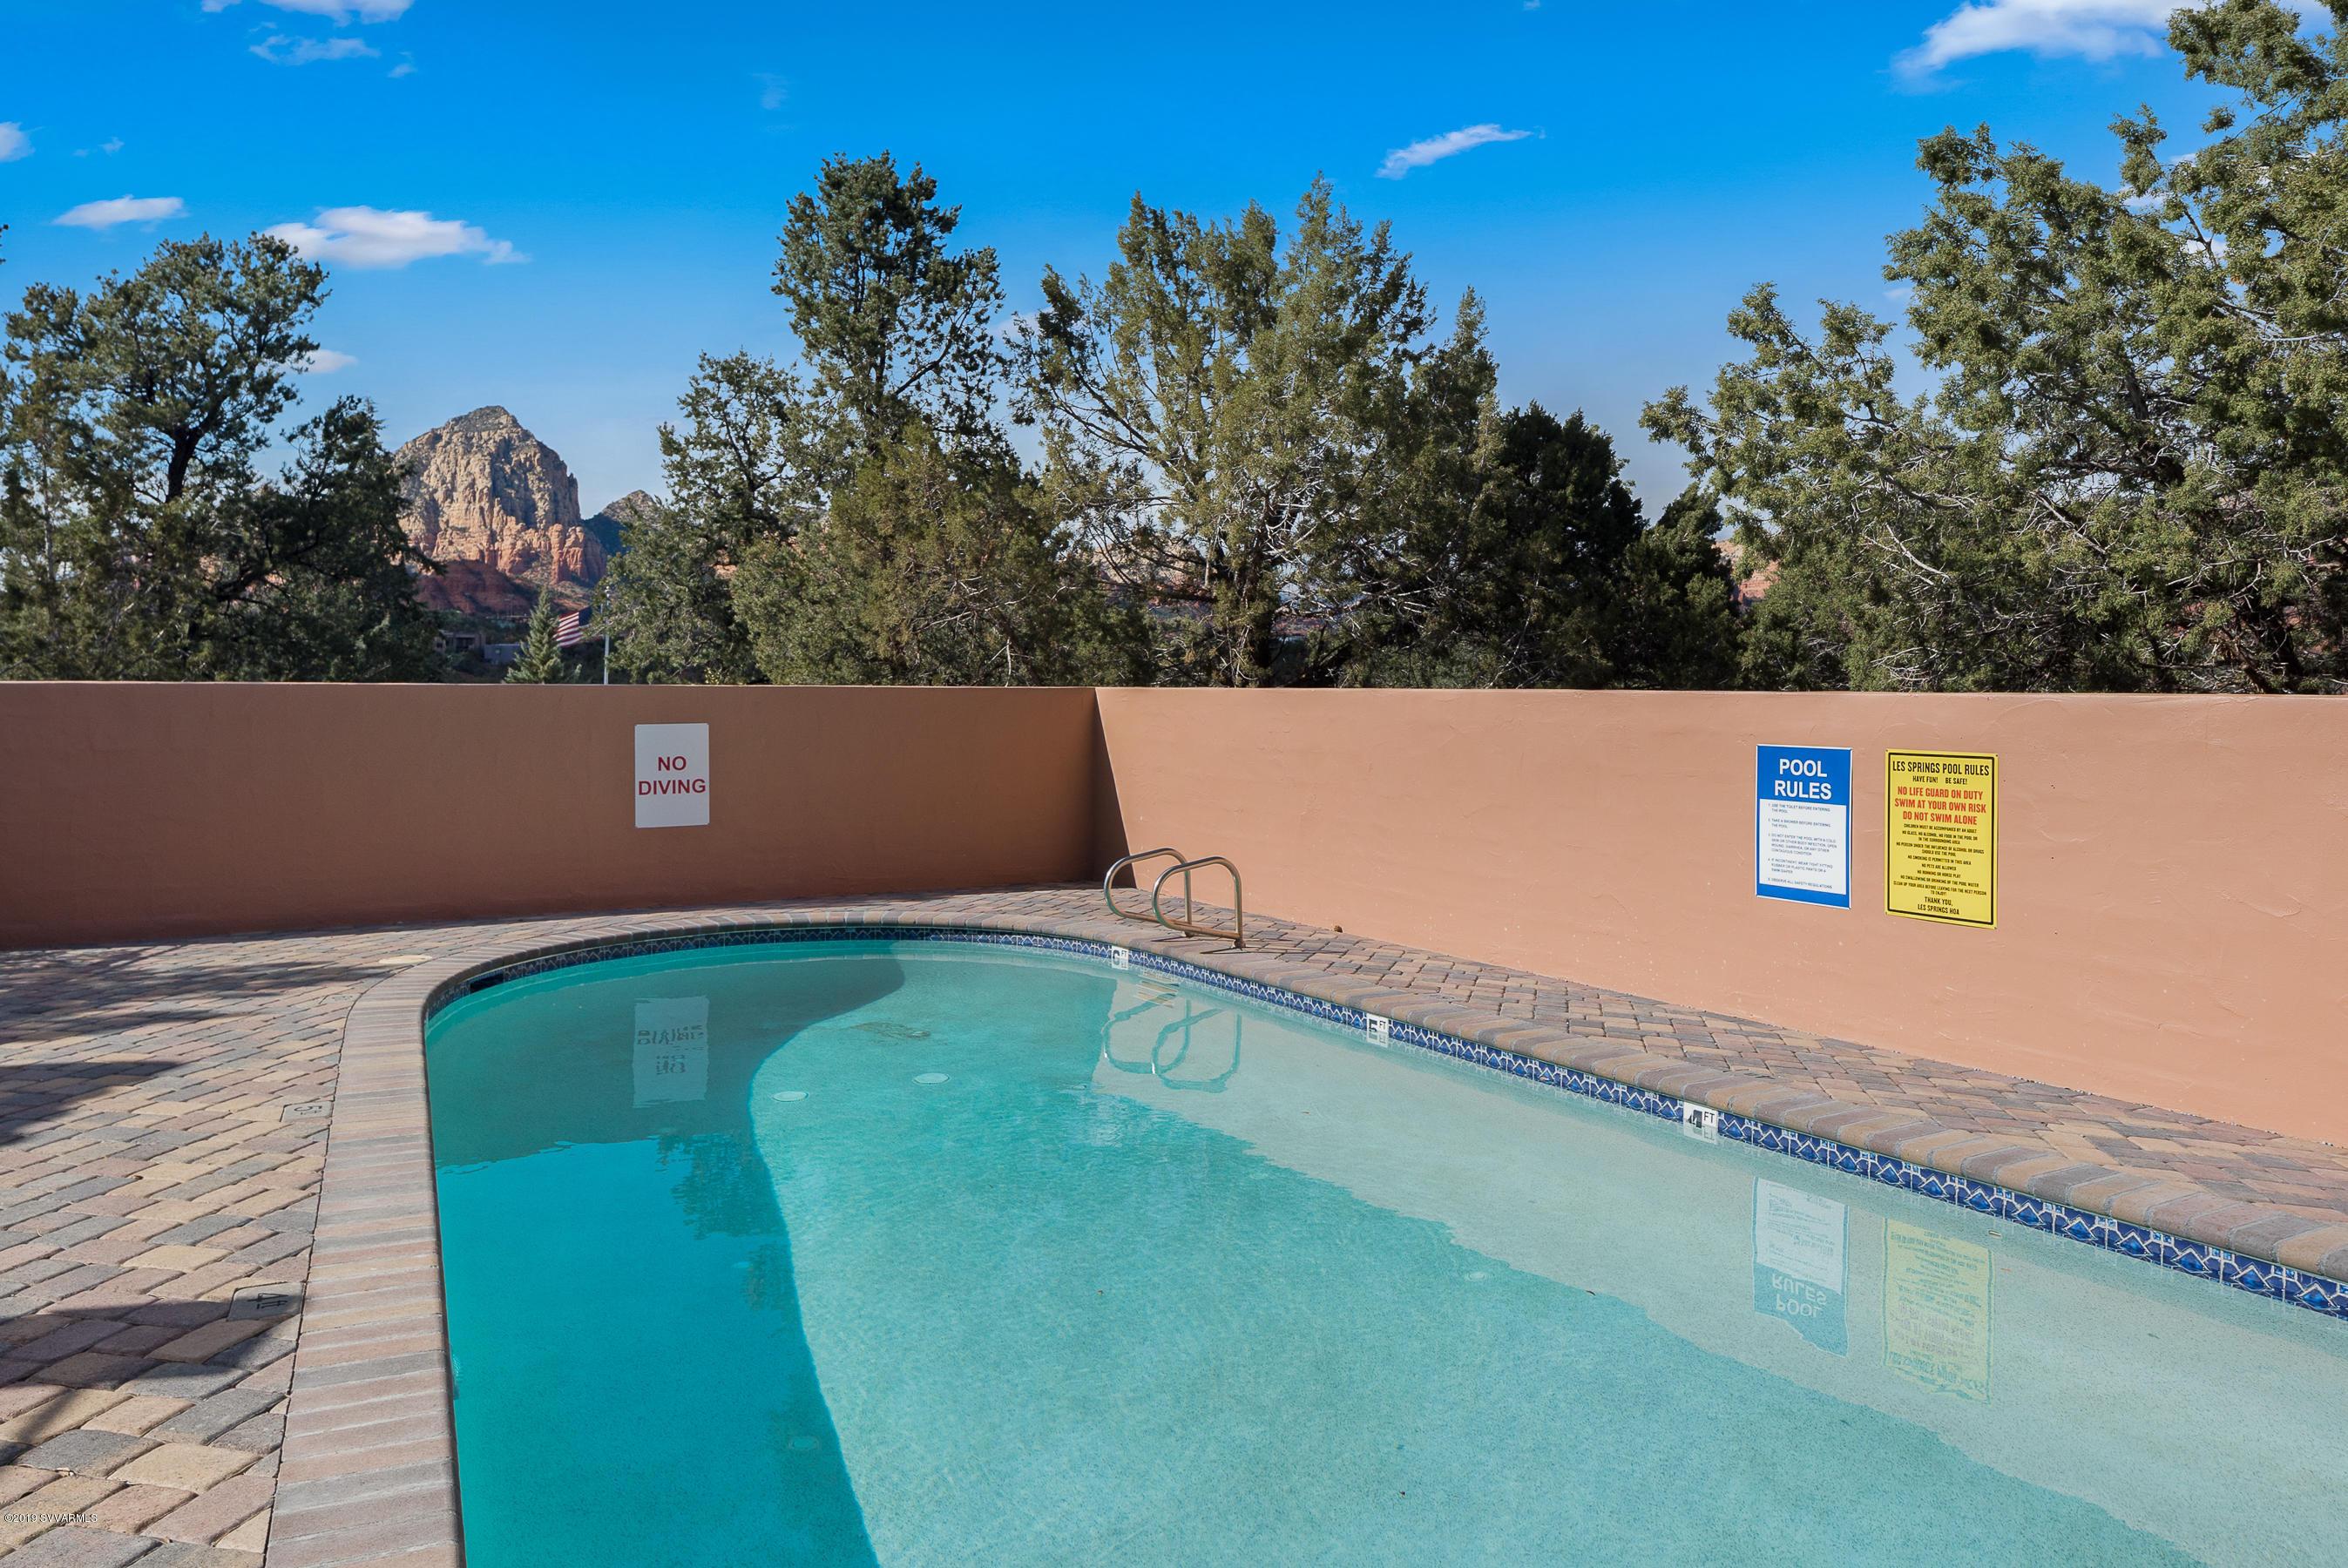 105 Les Springs Drive Sedona, AZ 86336